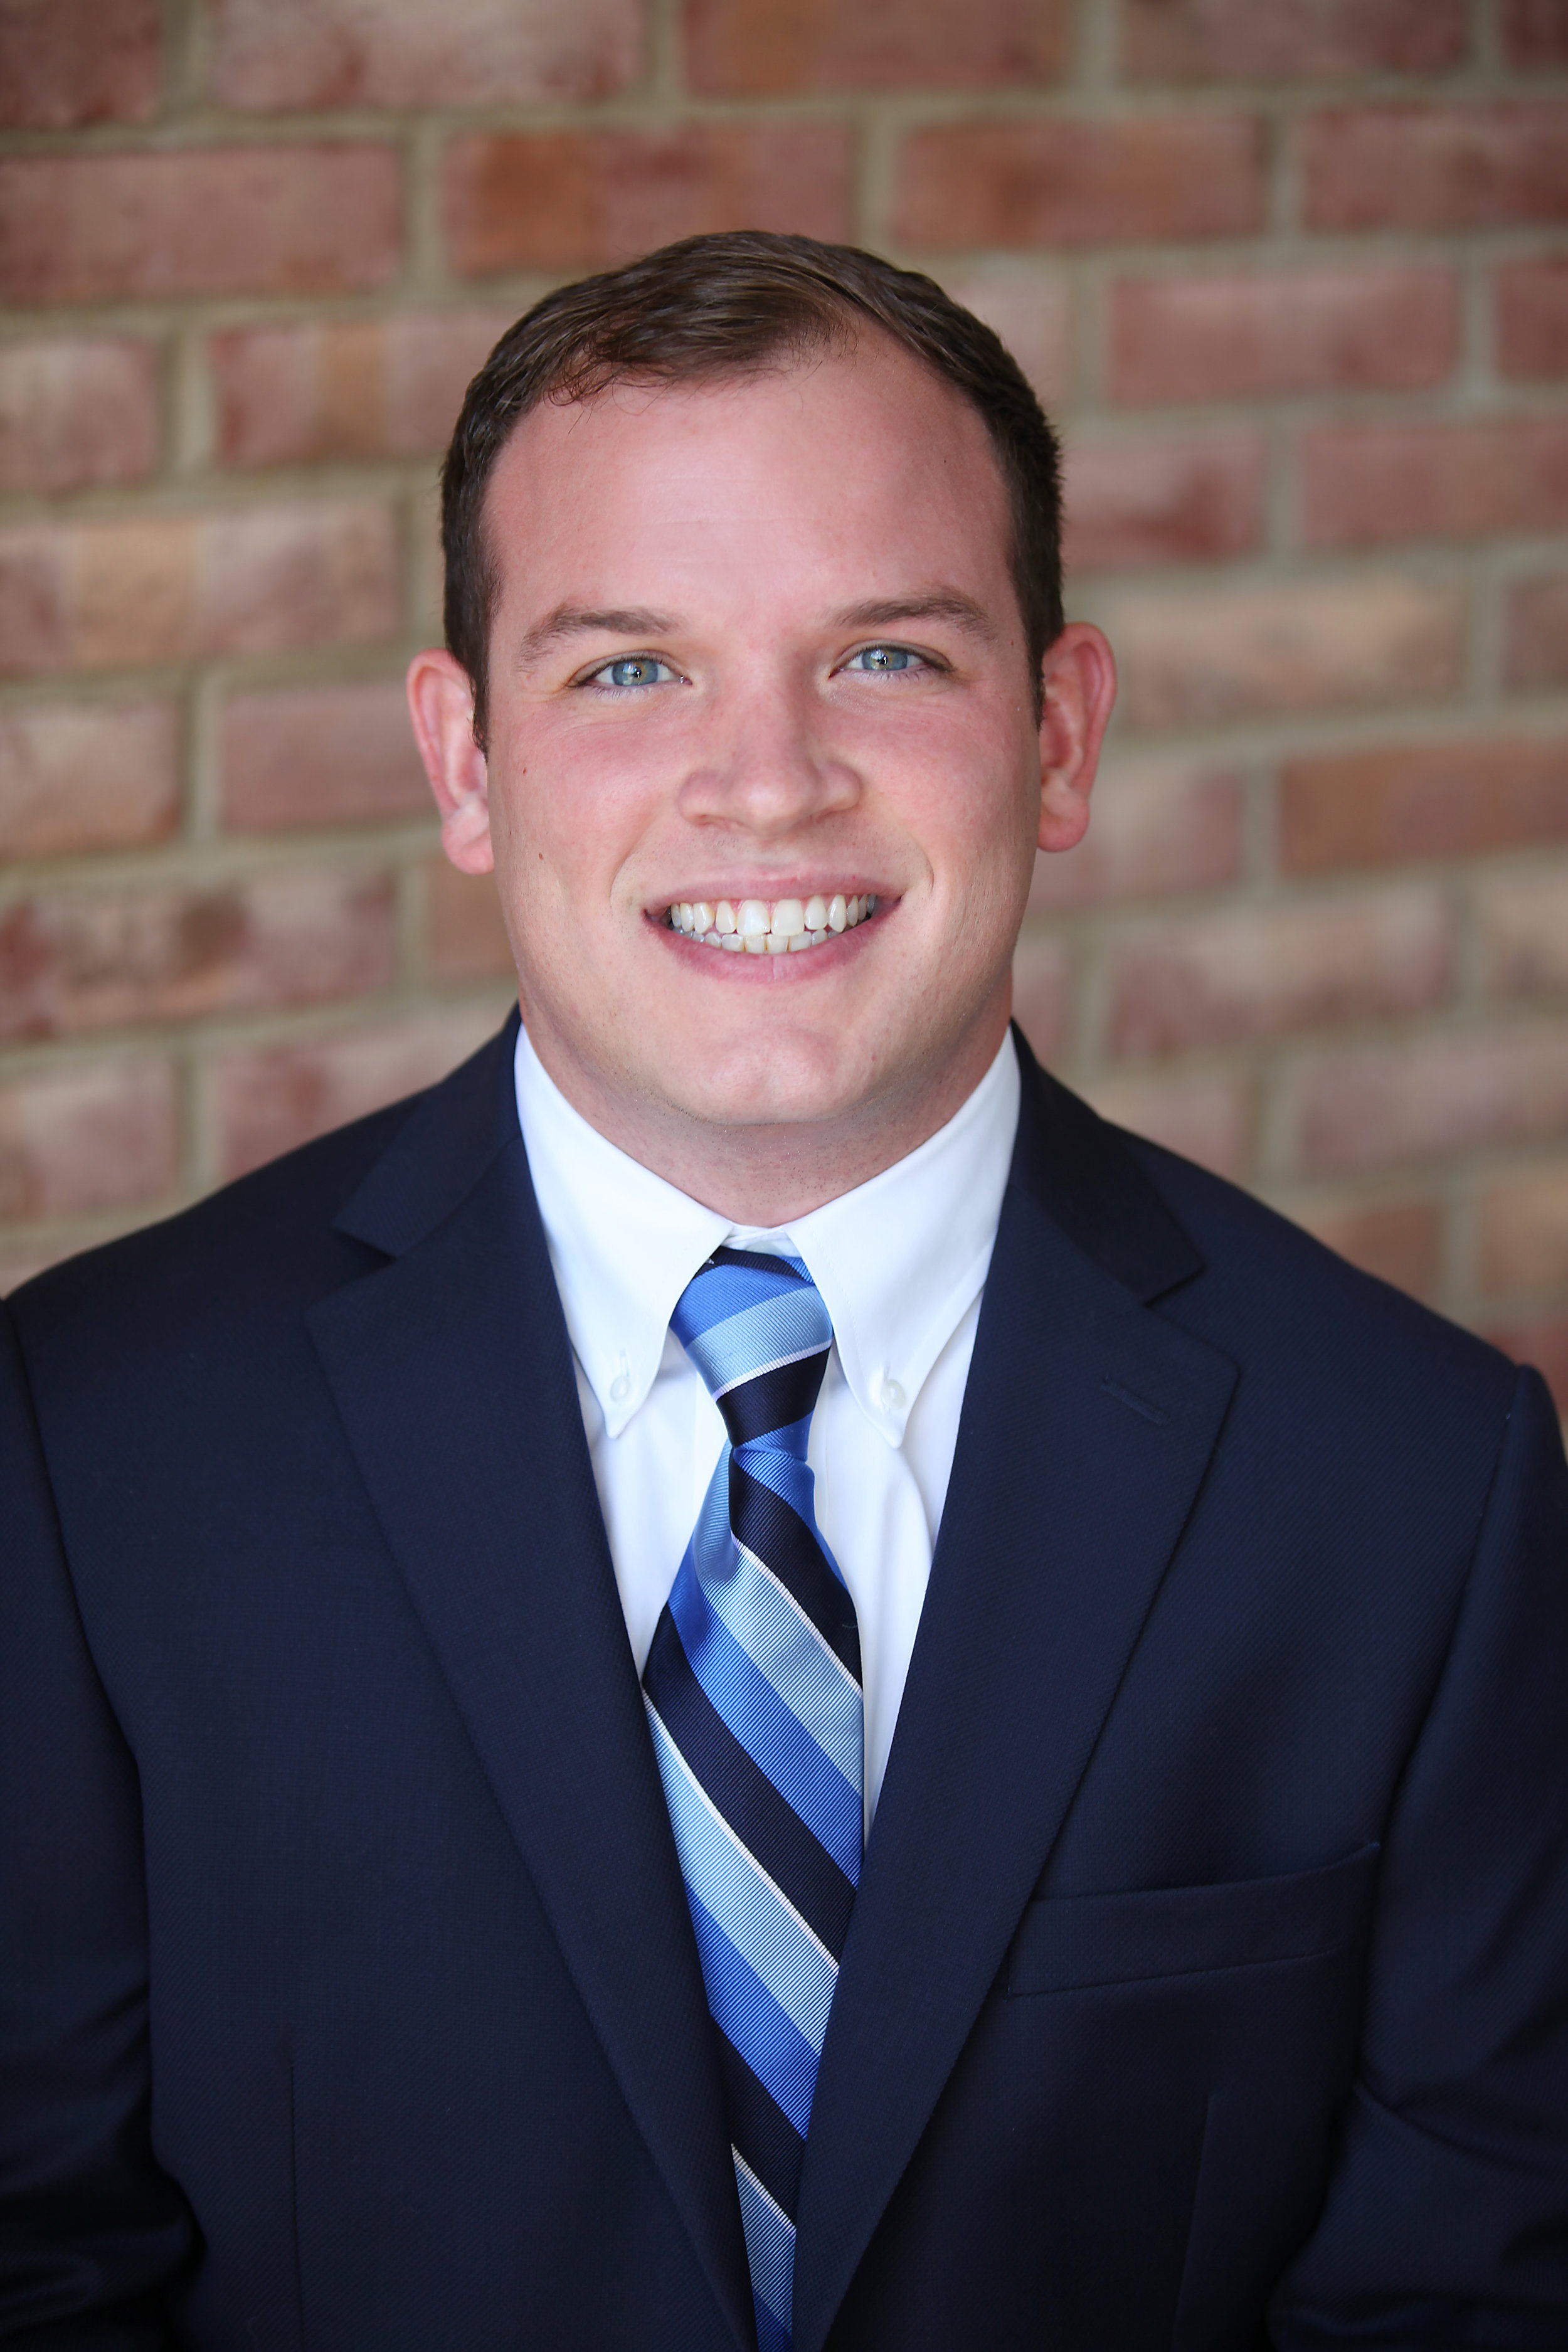 Kevin N. Greiner - SENIOR ASSOCIATEkgreiner@wswcpas.com